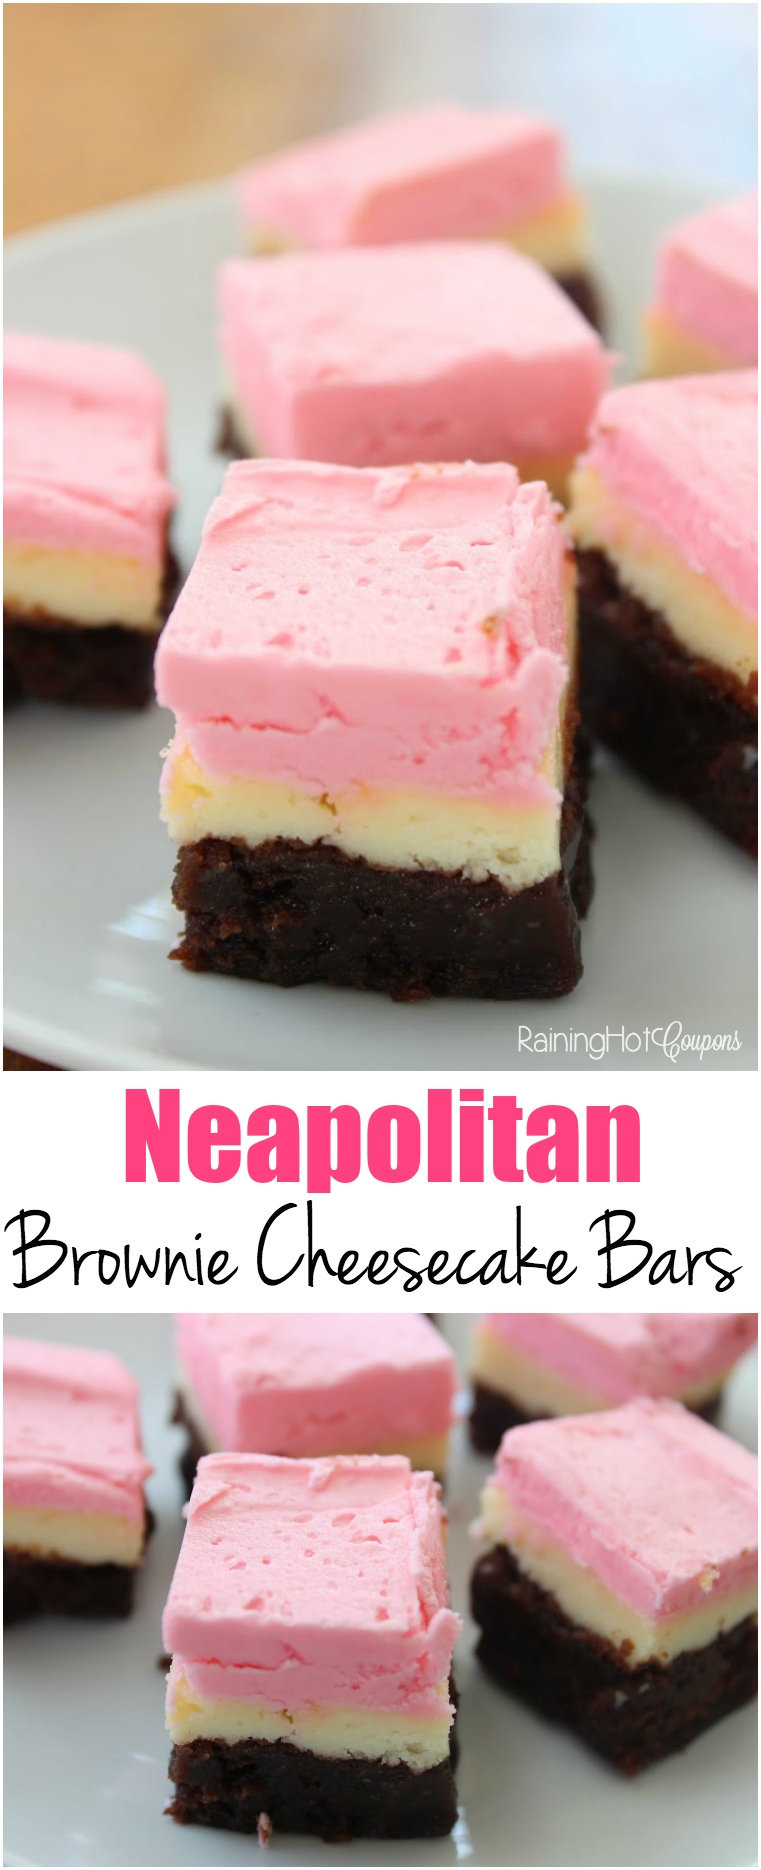 Neapolitan Brownie Cheesecake Bars